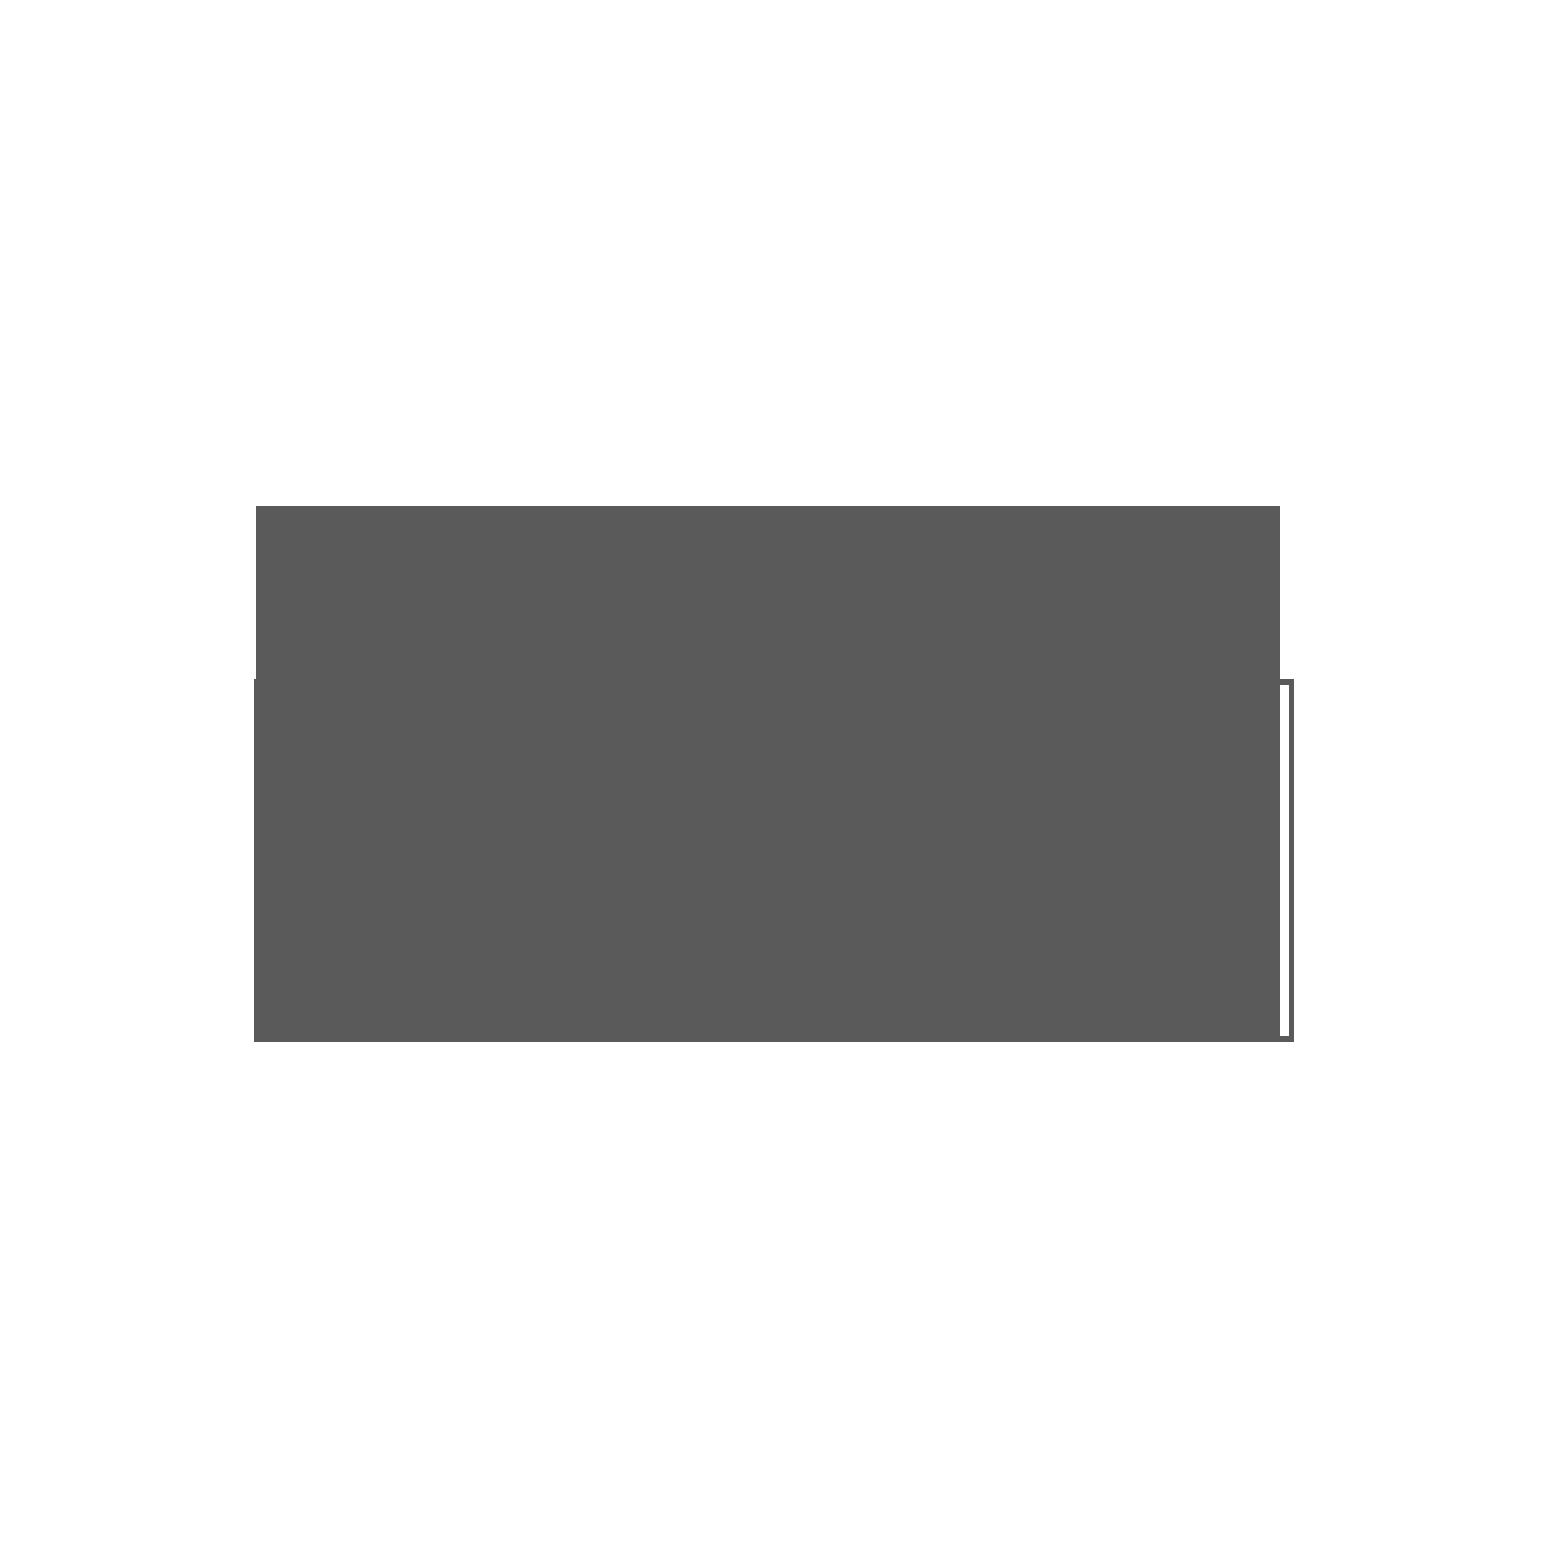 U.S. Courts